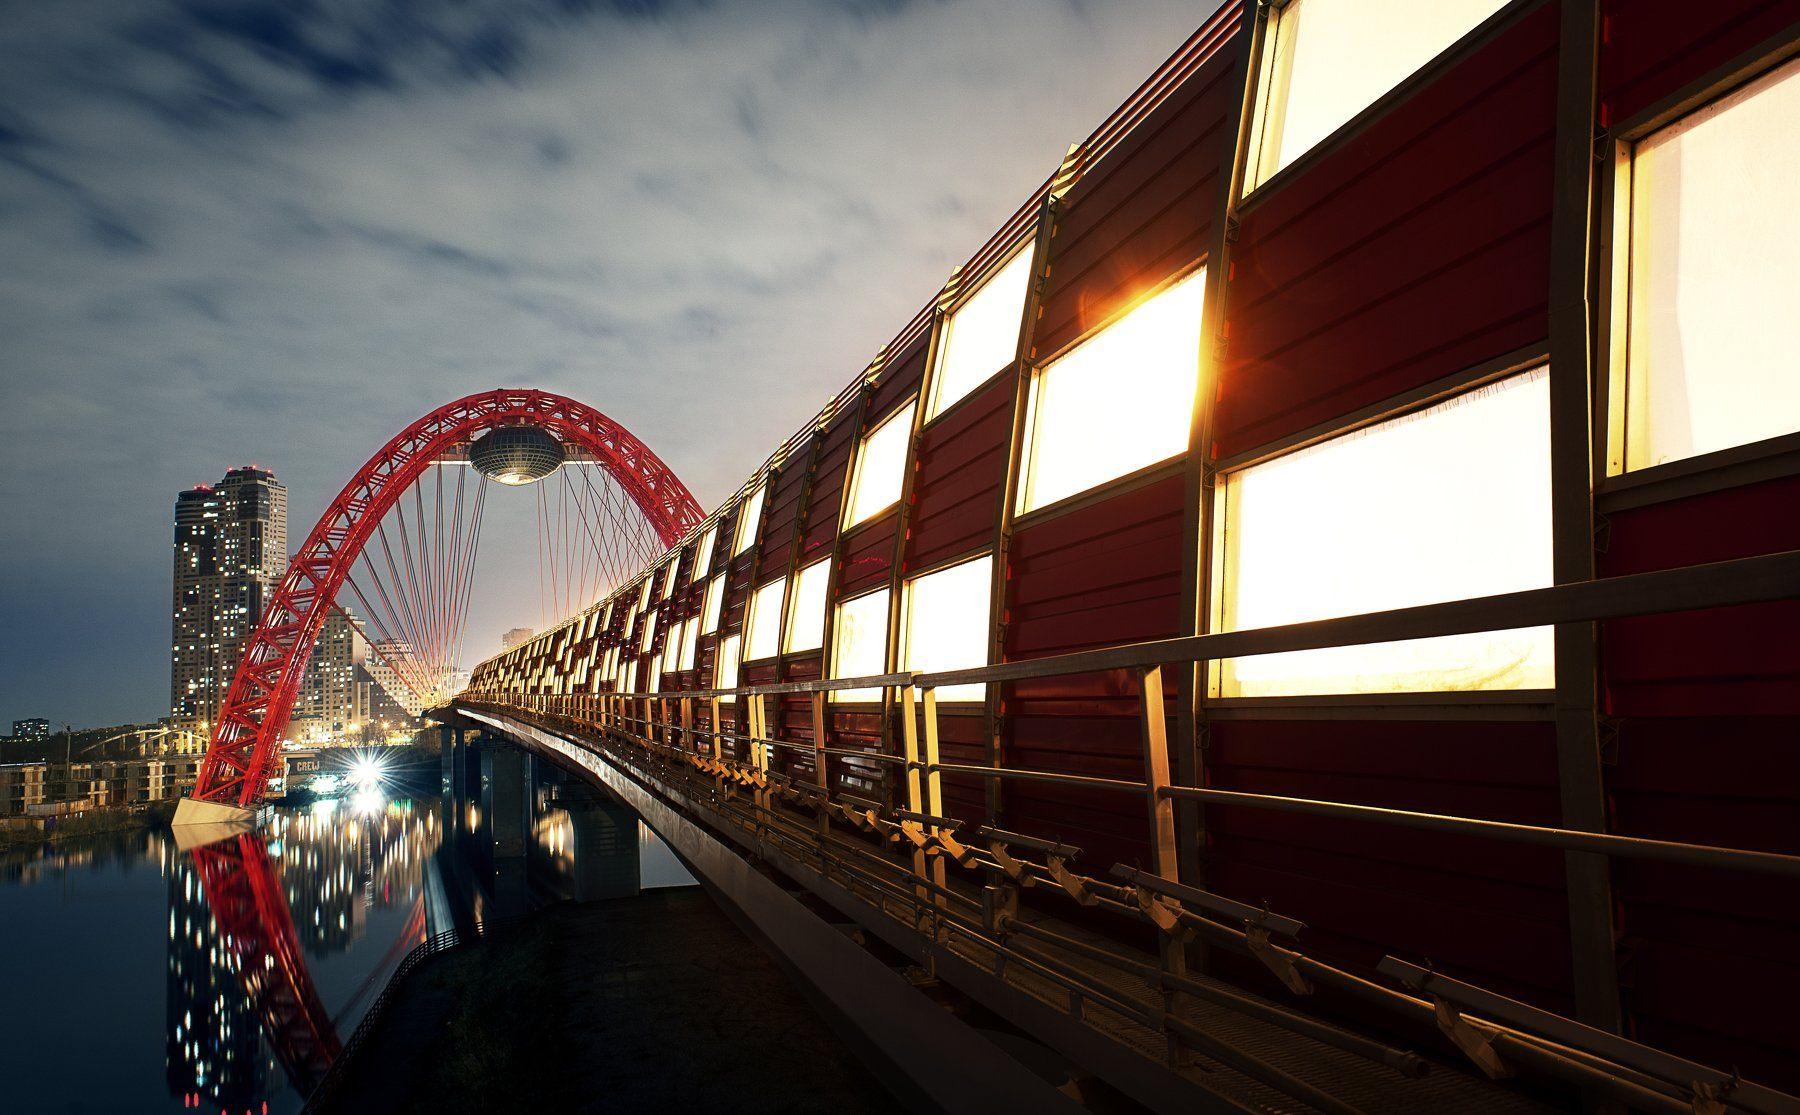 city, mockow, bridge, night, landscape, Некрасов Сергей